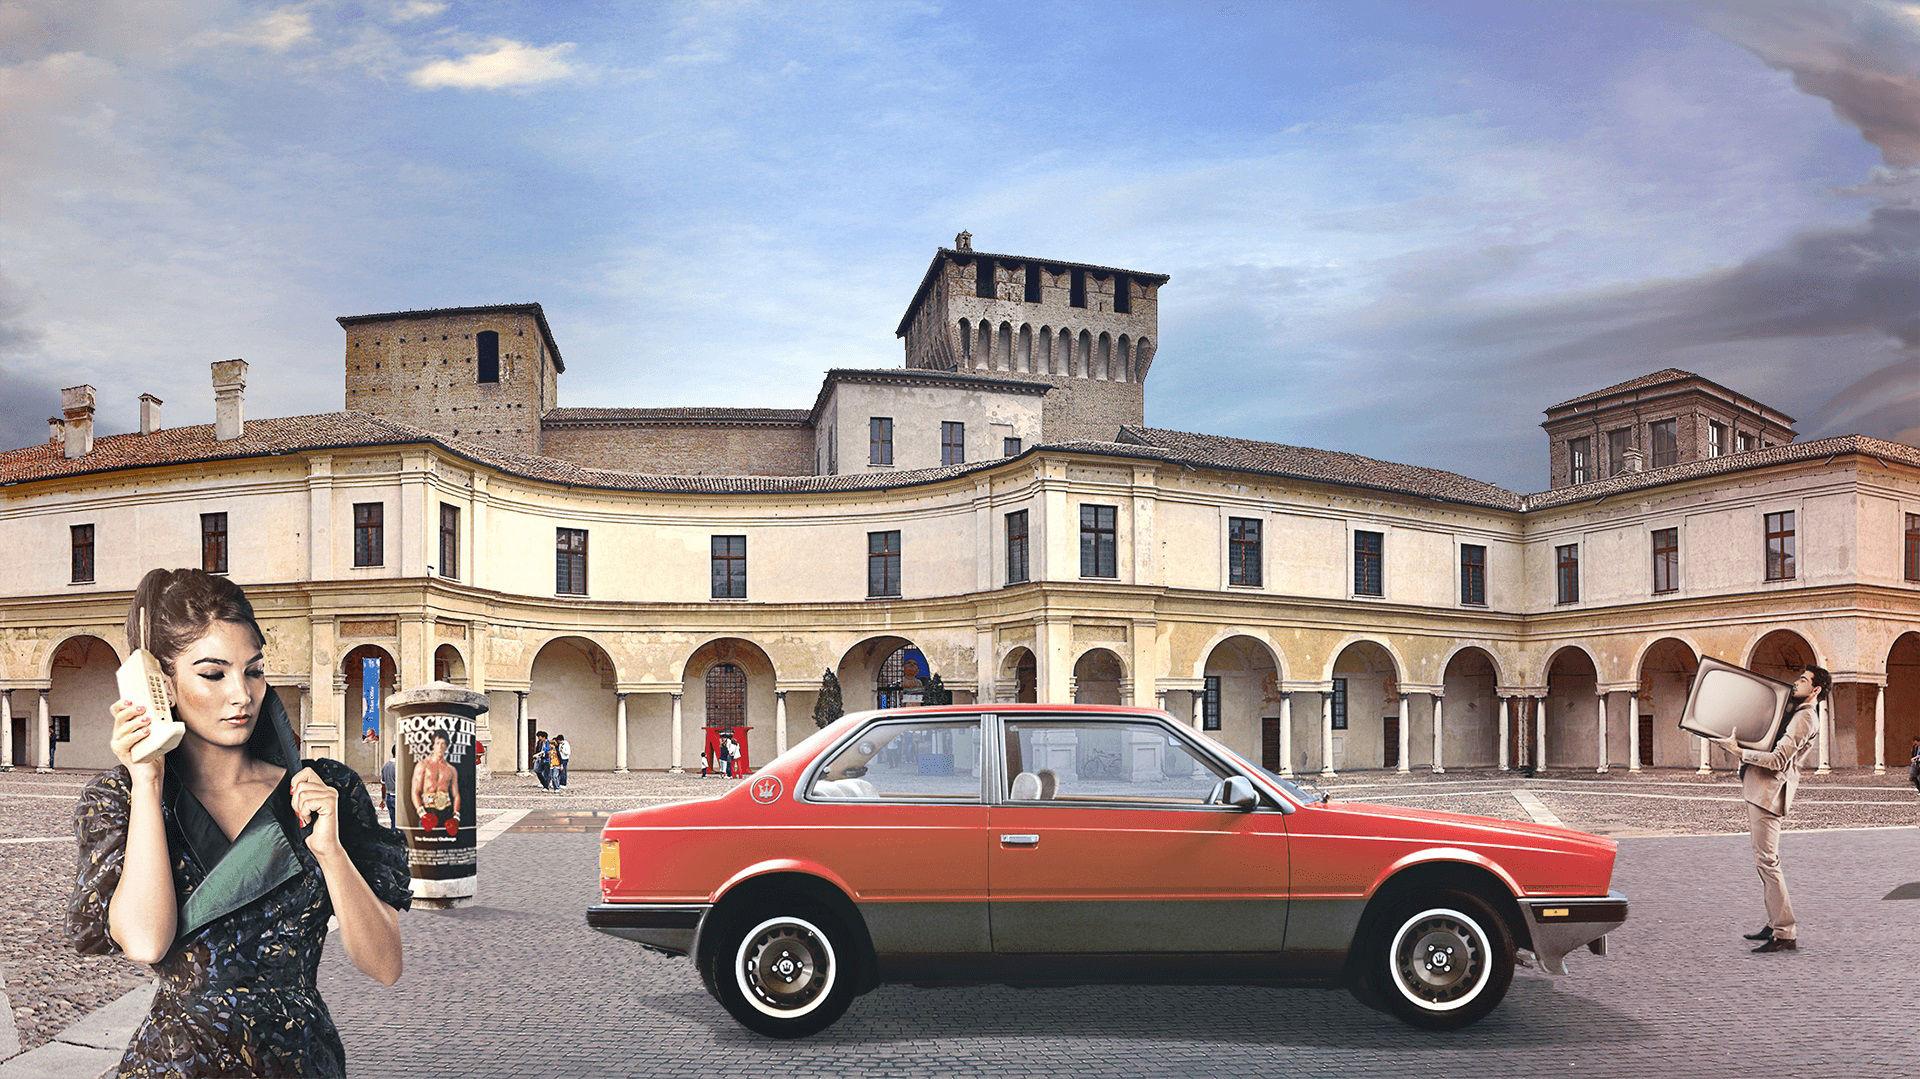 Storia di Maserati - 1980: Maserati Biturbo in una città italiana